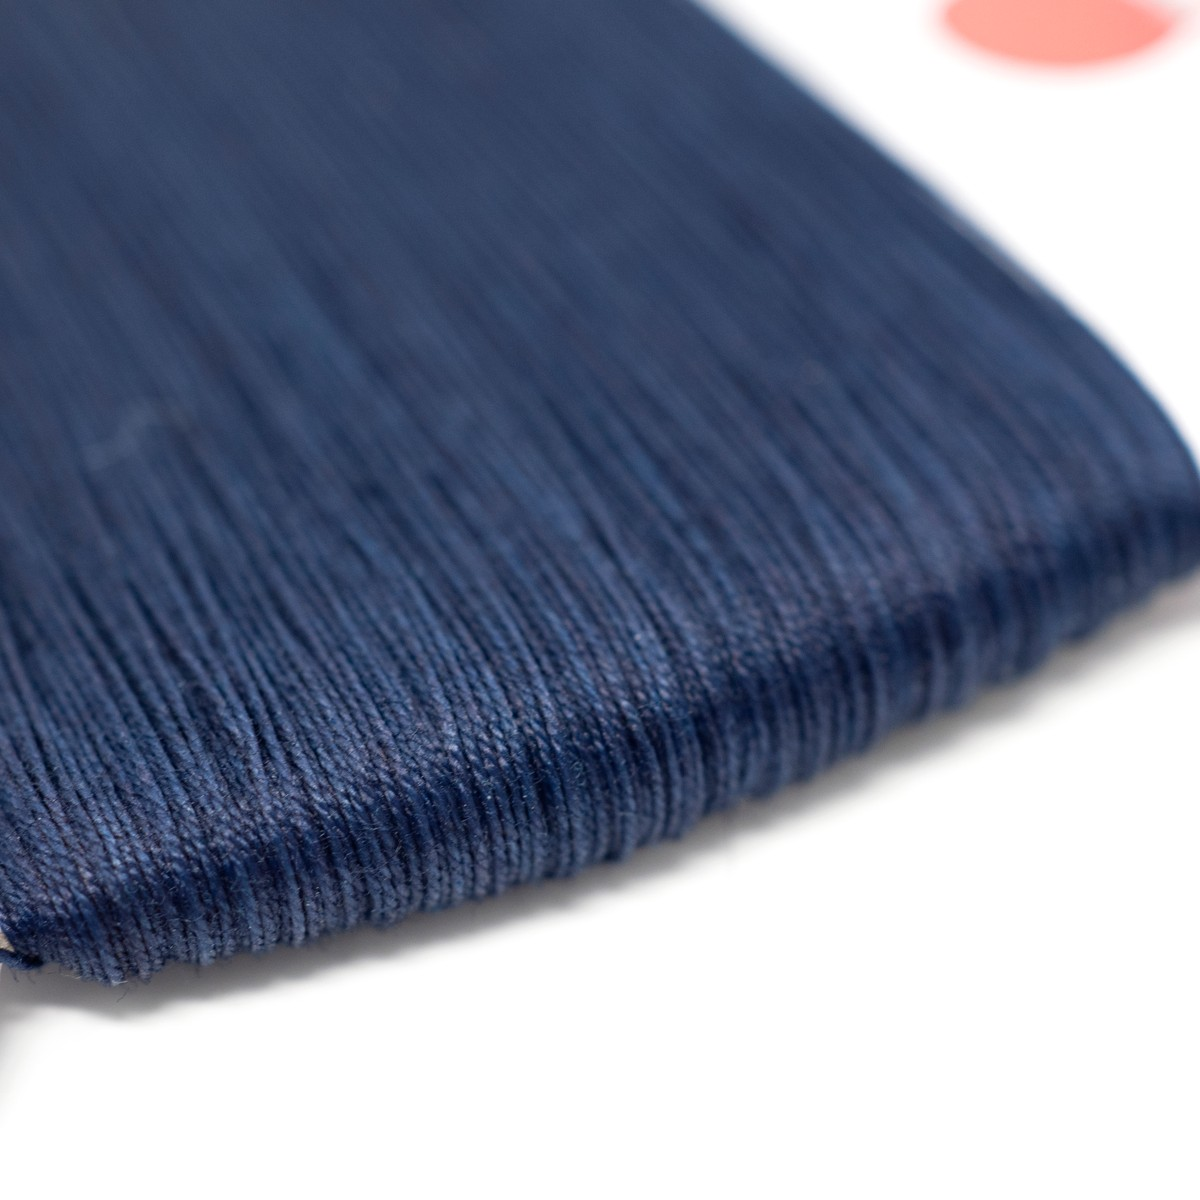 Photo of BUAISOU Sewing Thread: Deep Blue